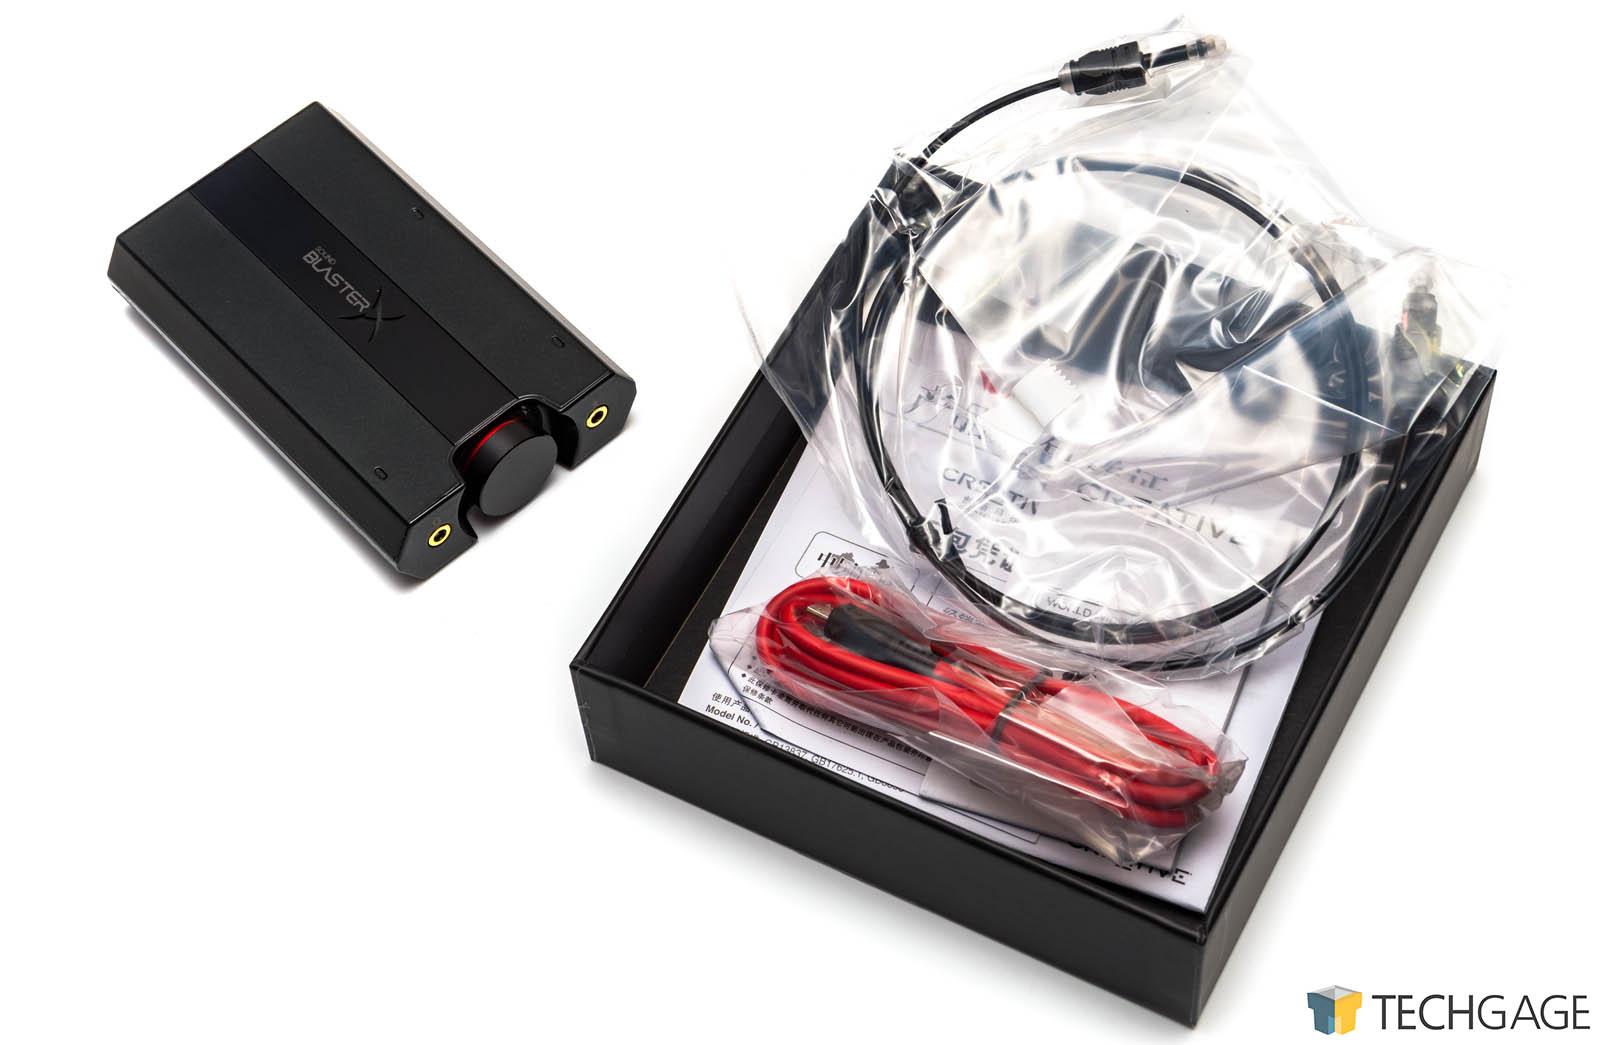 Creative Sound BlasterX G5 External Soundcard & Headphone Amp Review